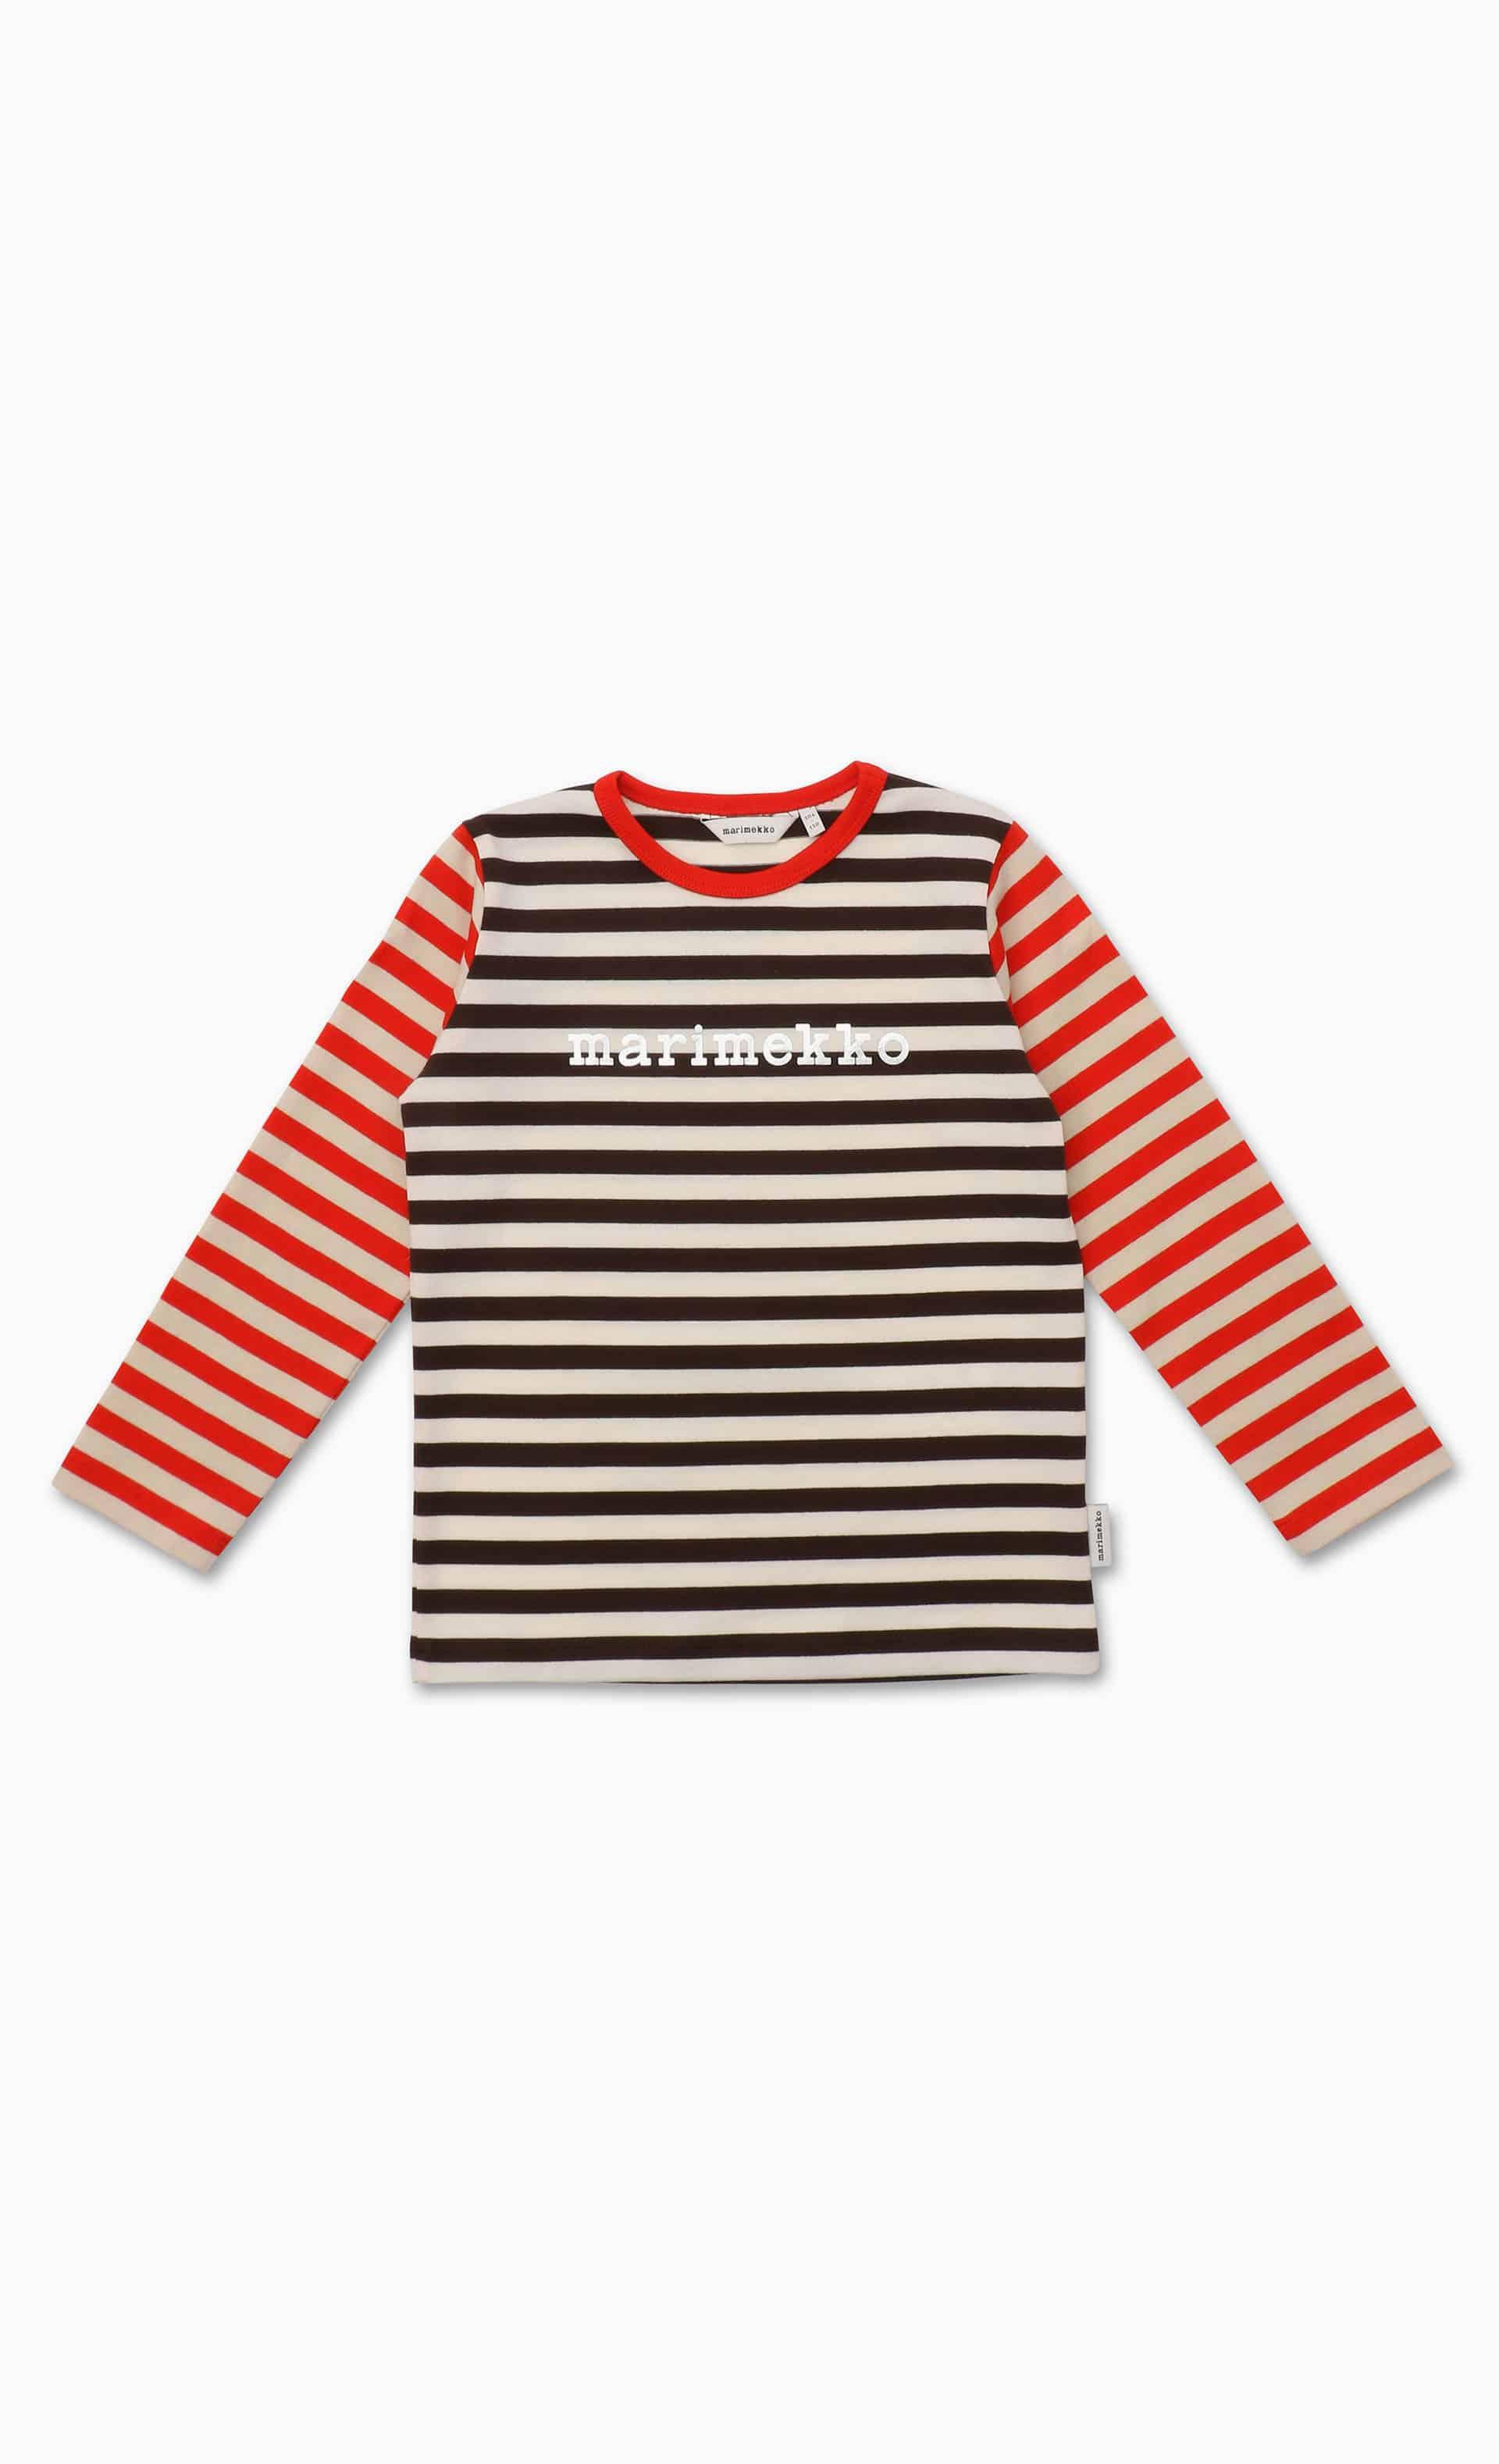 [Kids]Vede Tasaraita 2 Tシャツ